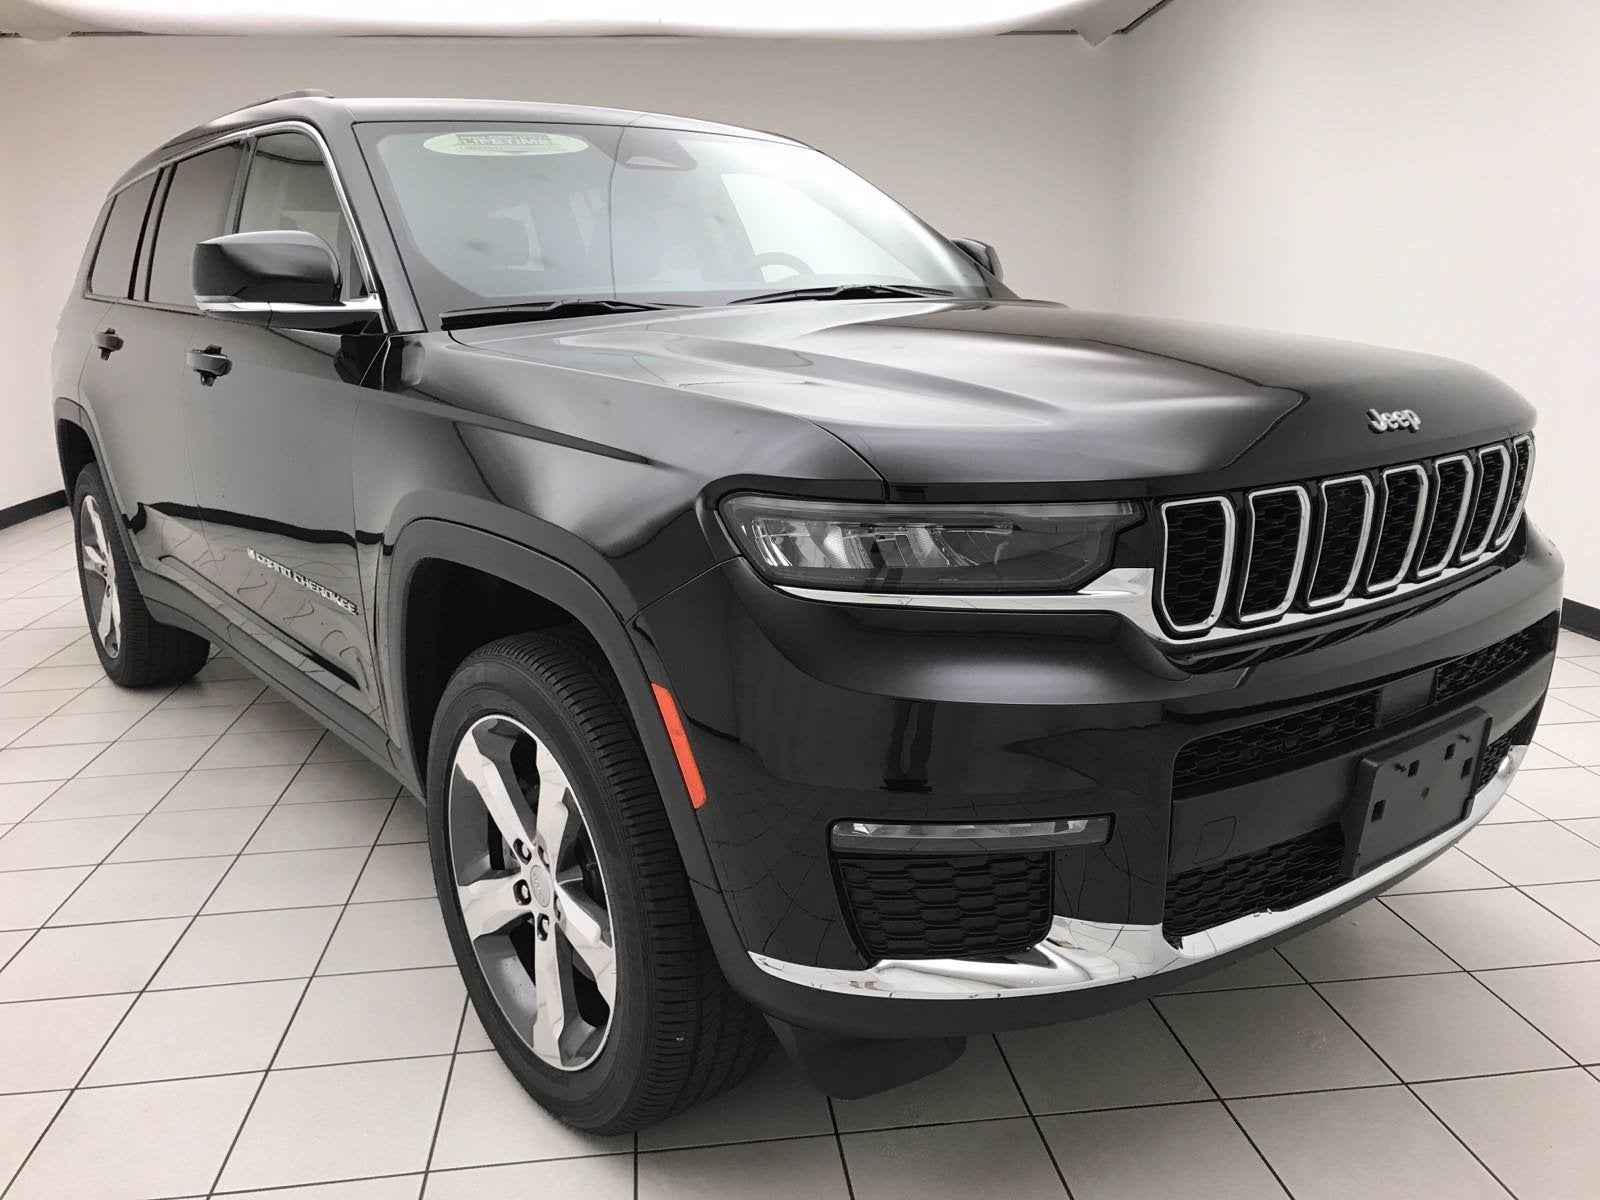 2021 Jeep Grand Cherokee L Sheboygan WI